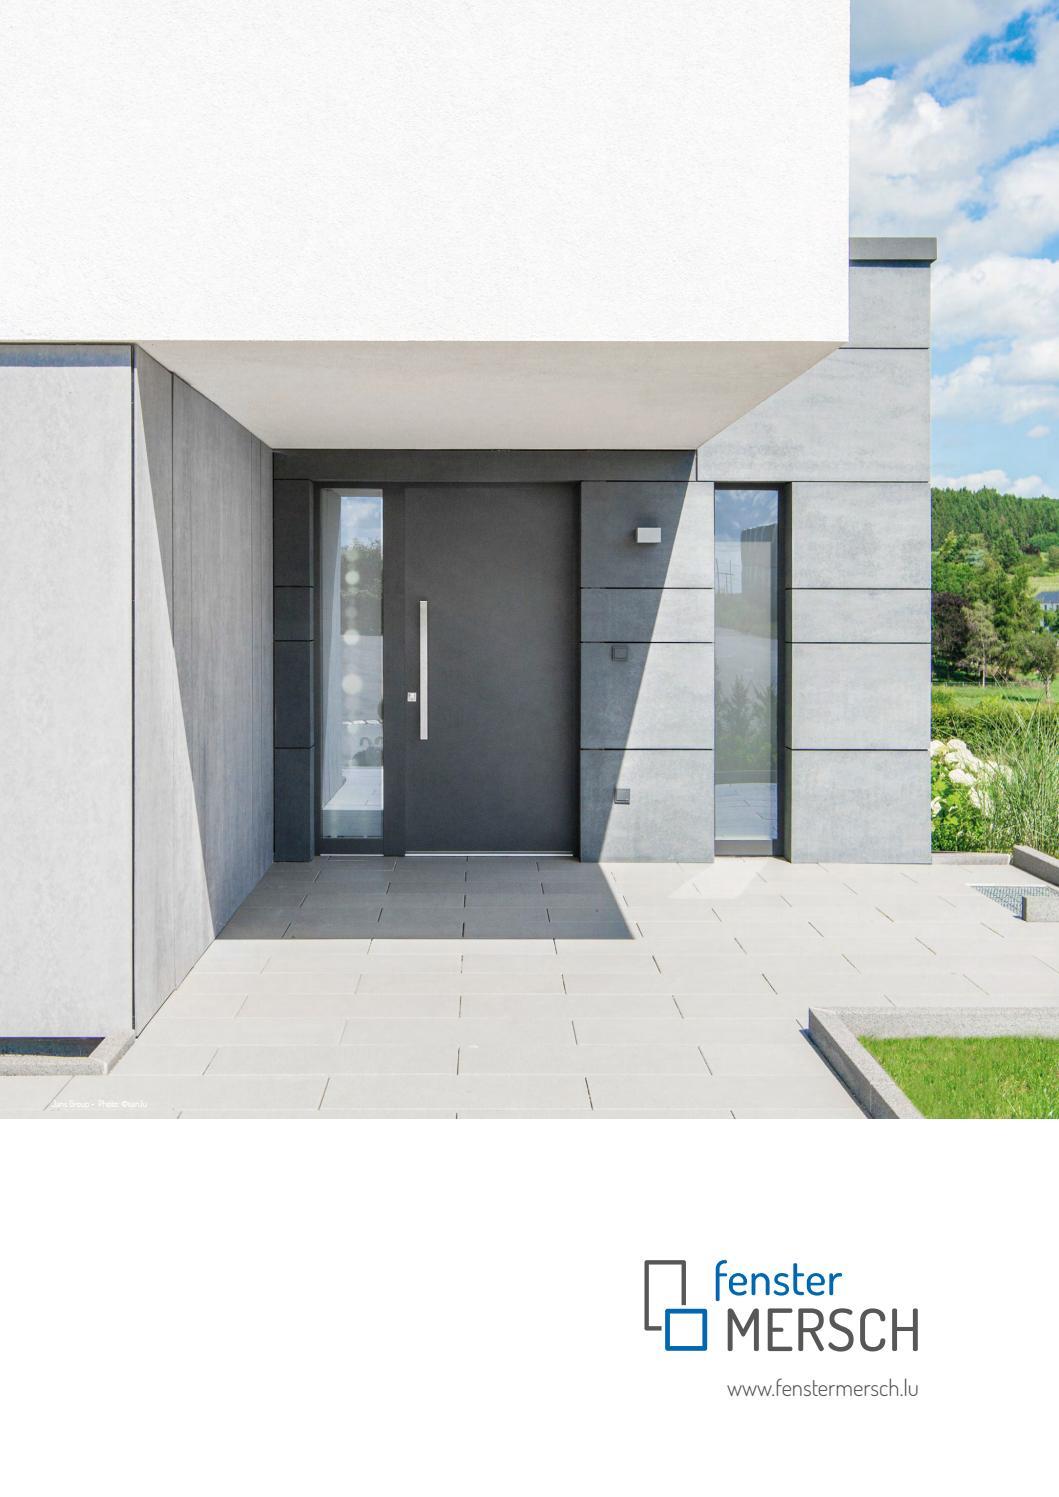 Fenster Mersch Katalog by SAN s.àr.l. - issuu